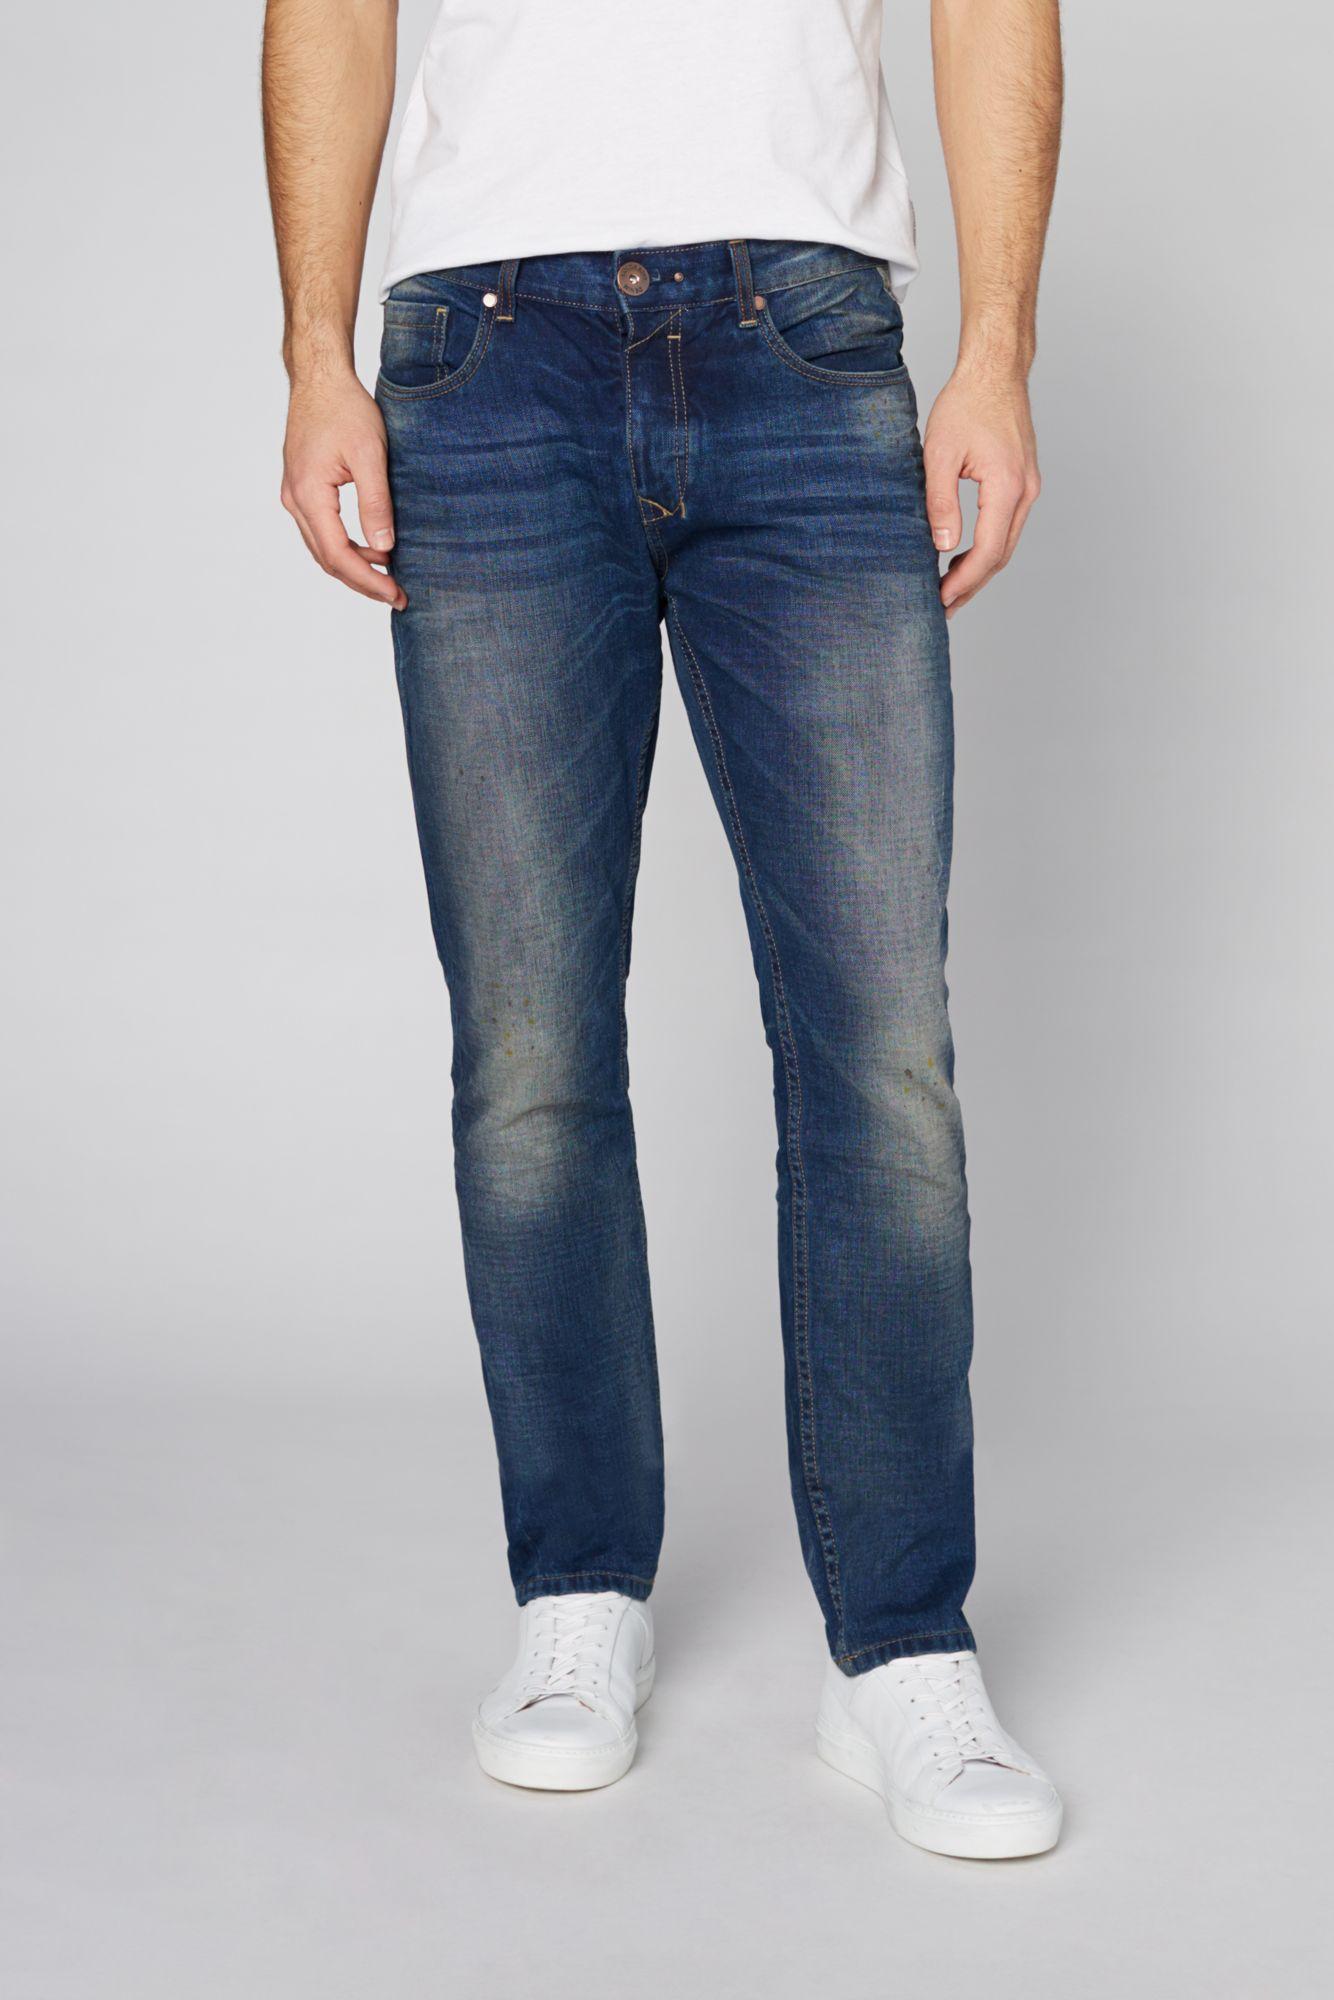 COLORADO DENIM  Jeans »C938 TAPERED Herren Jeans«